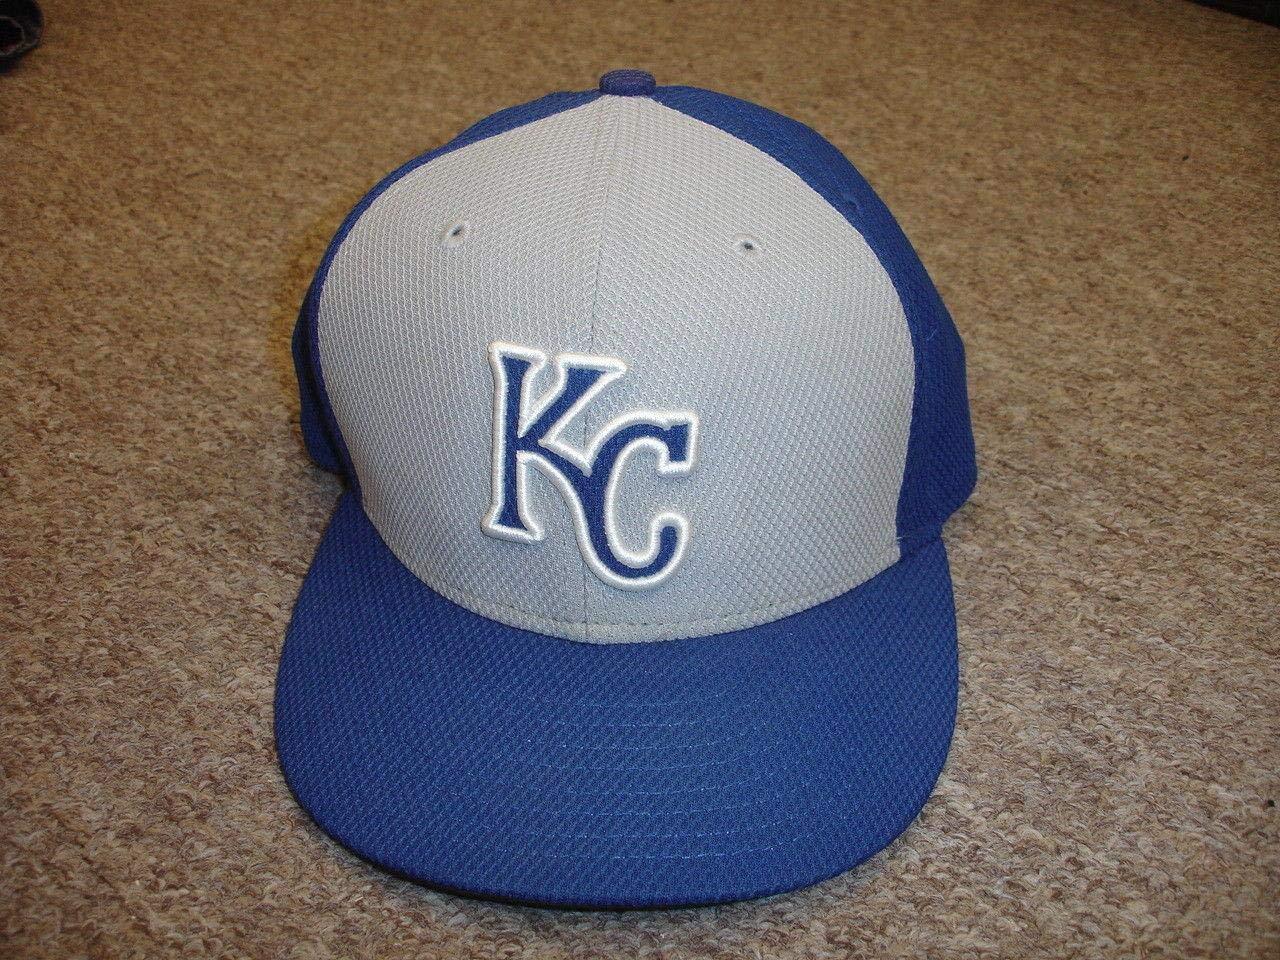 circa 2015 Rafael Belliard Kansas City Royals Game Used Coaches Hat size 7 1/8 Game Used MLB Hats